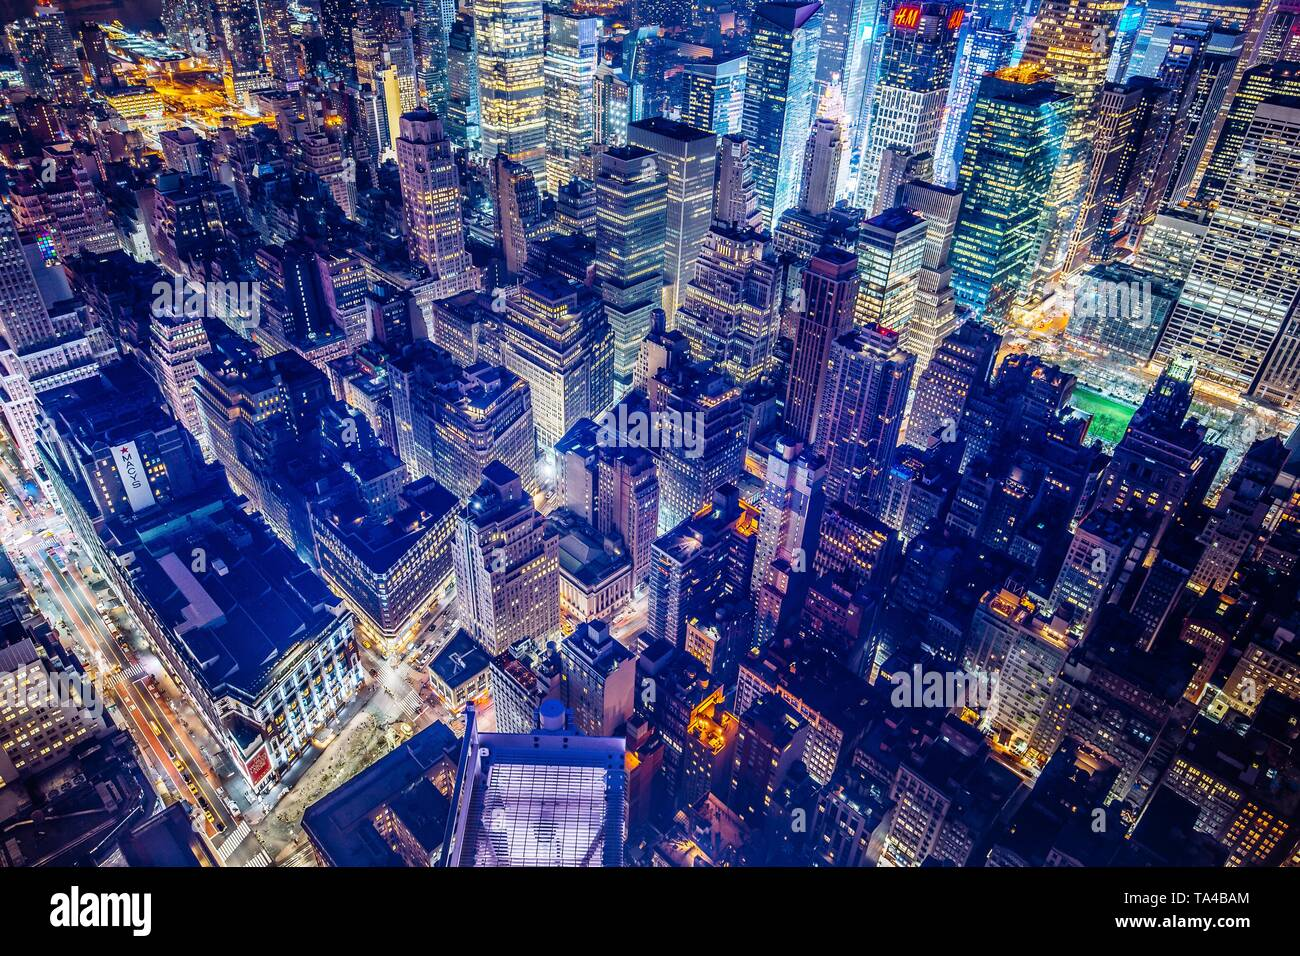 Beautiful futuristic aerial shot of New York City at night - Stock Image